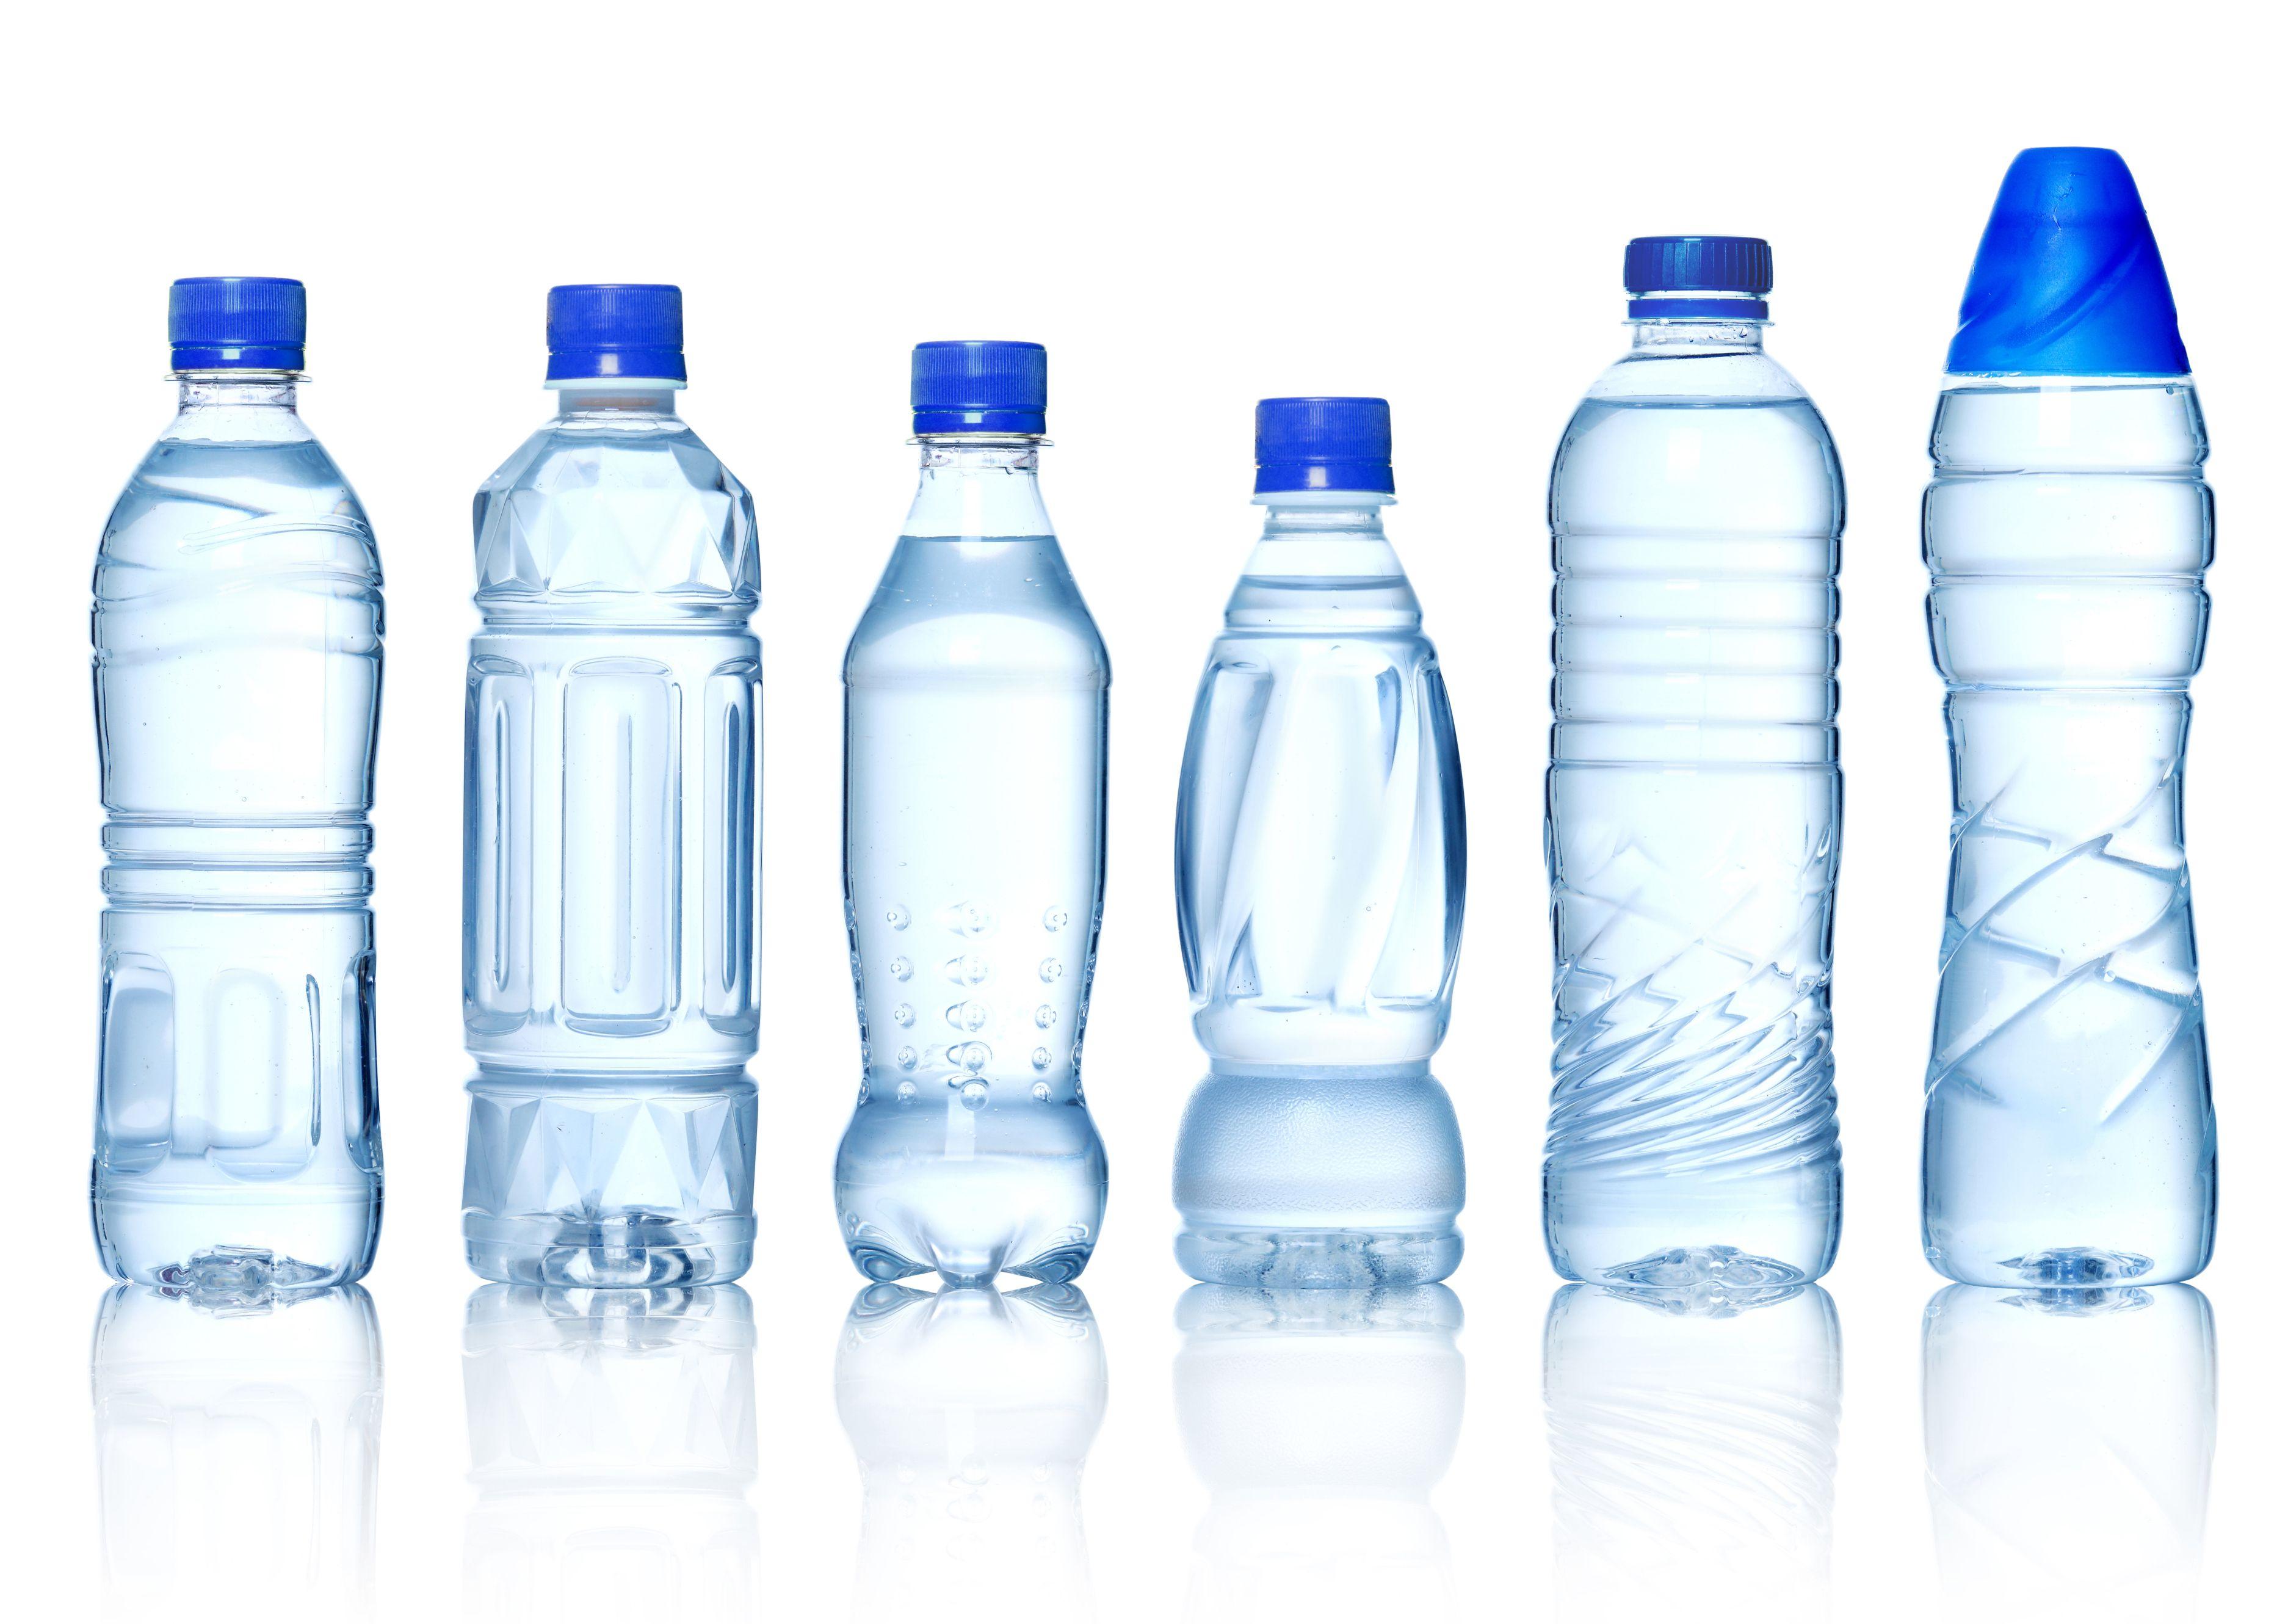 Drinking bottle design google search packaging for Decor drink bottle